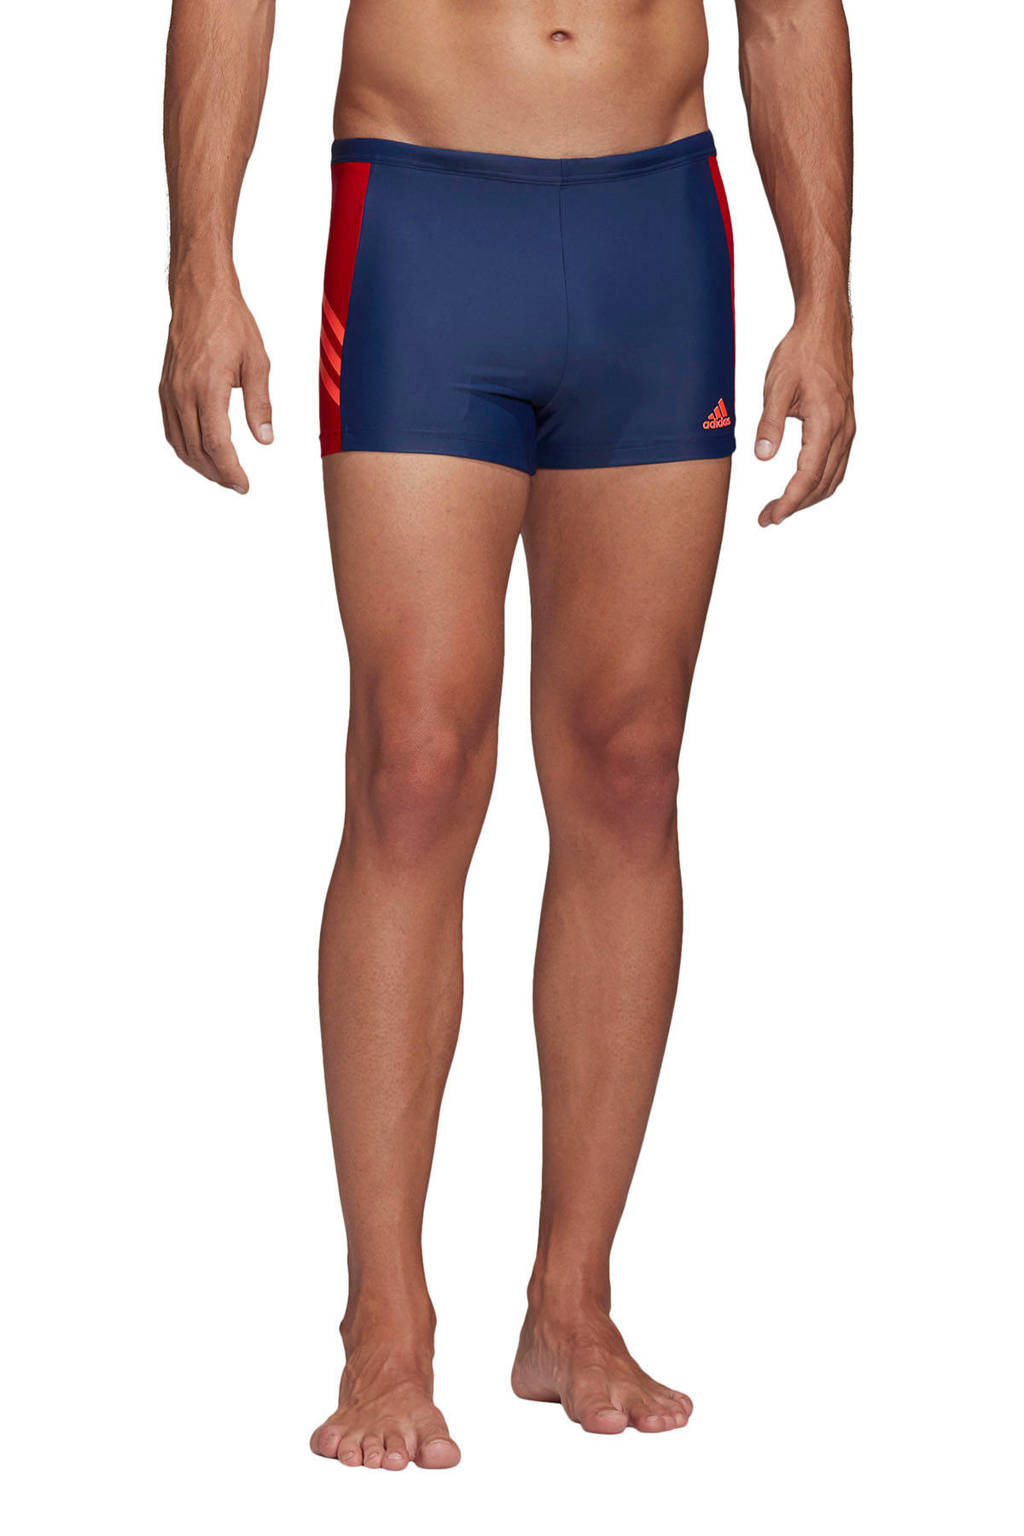 adidas Performance zwemboxer blauw/rood, Blauw/rood